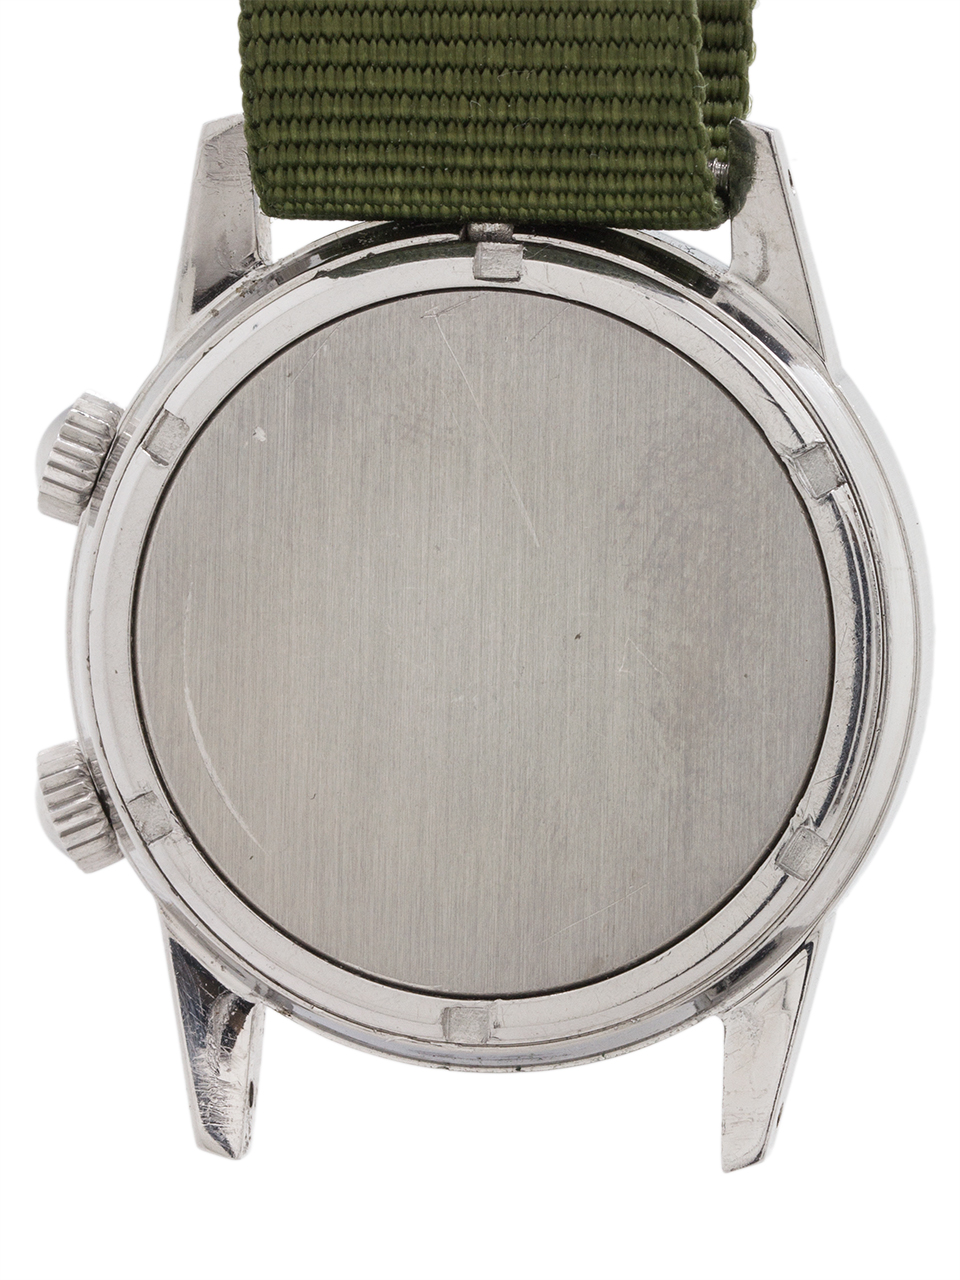 Tudor Advisor Alarm ref #10050 Stainless Steel circa 1982